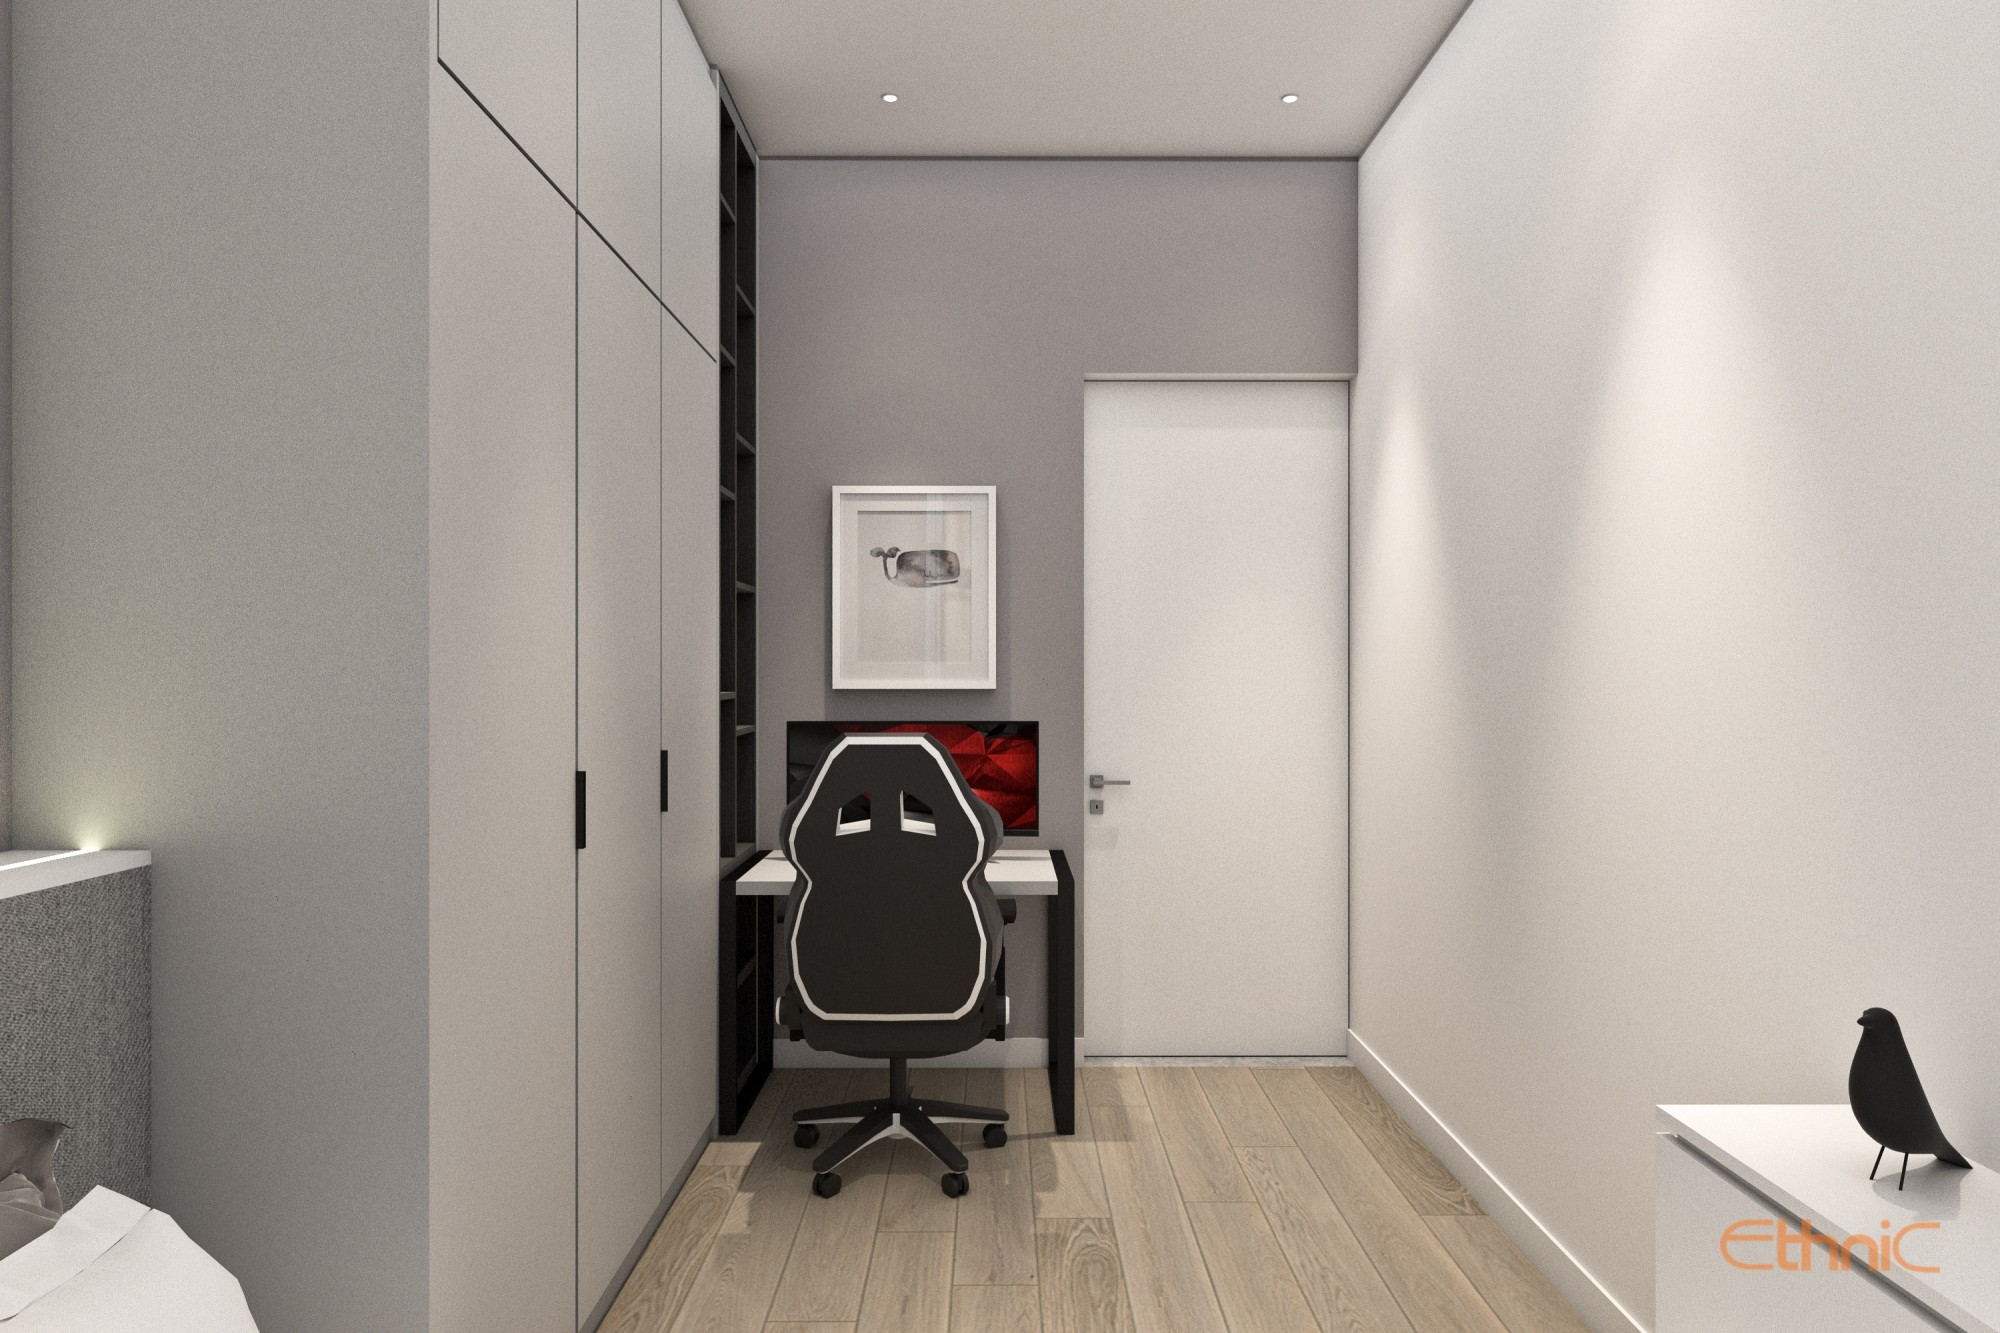 Penang Interior Design Renovation Modern Style